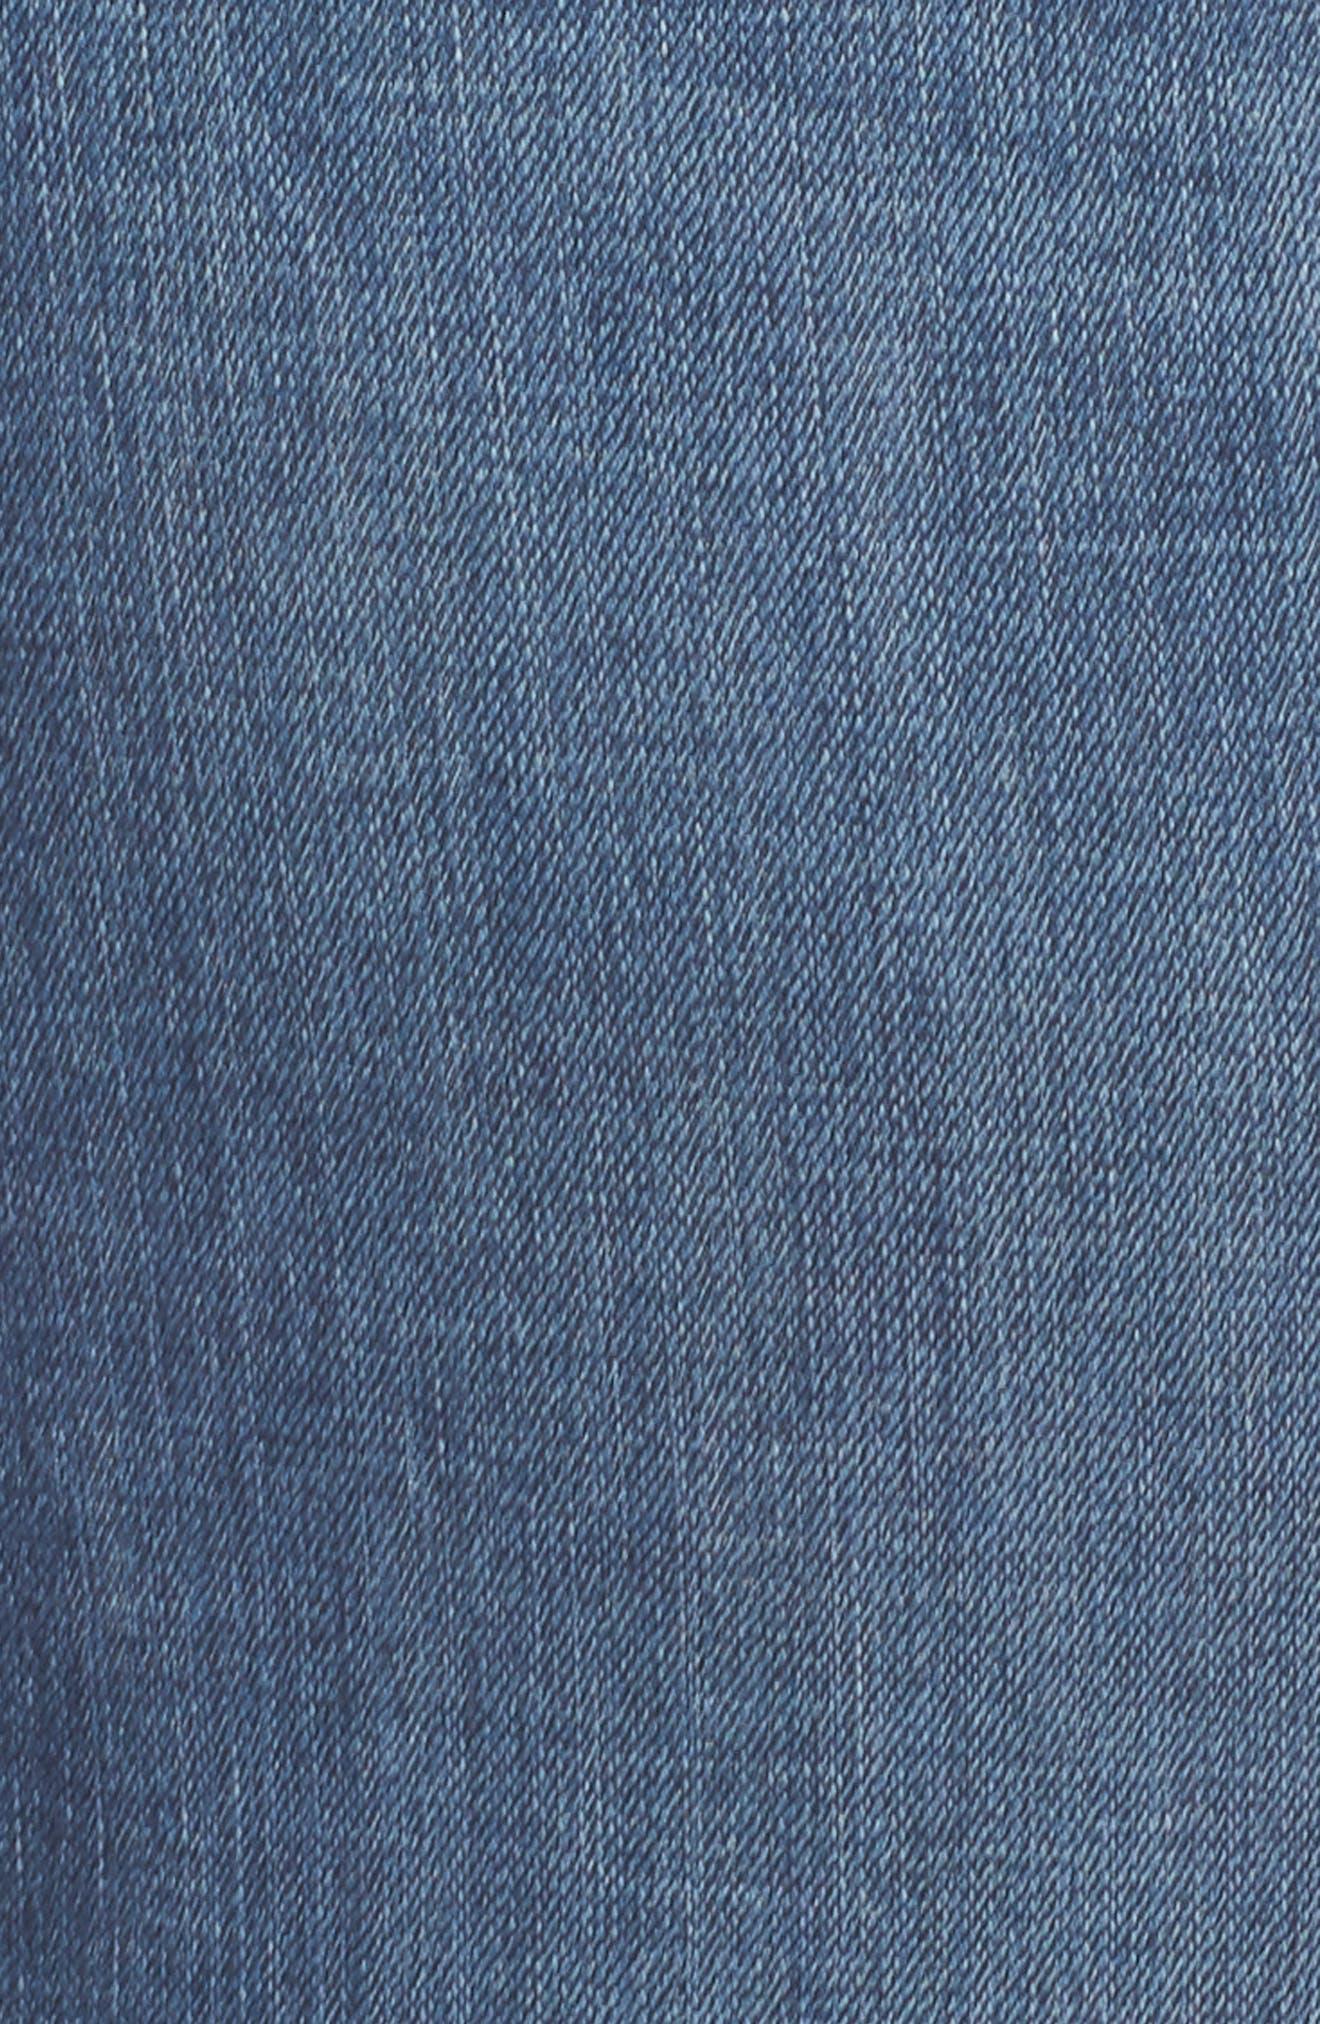 Emma Crop Skinny Jeans,                             Alternate thumbnail 6, color,                             Sunbeam-P